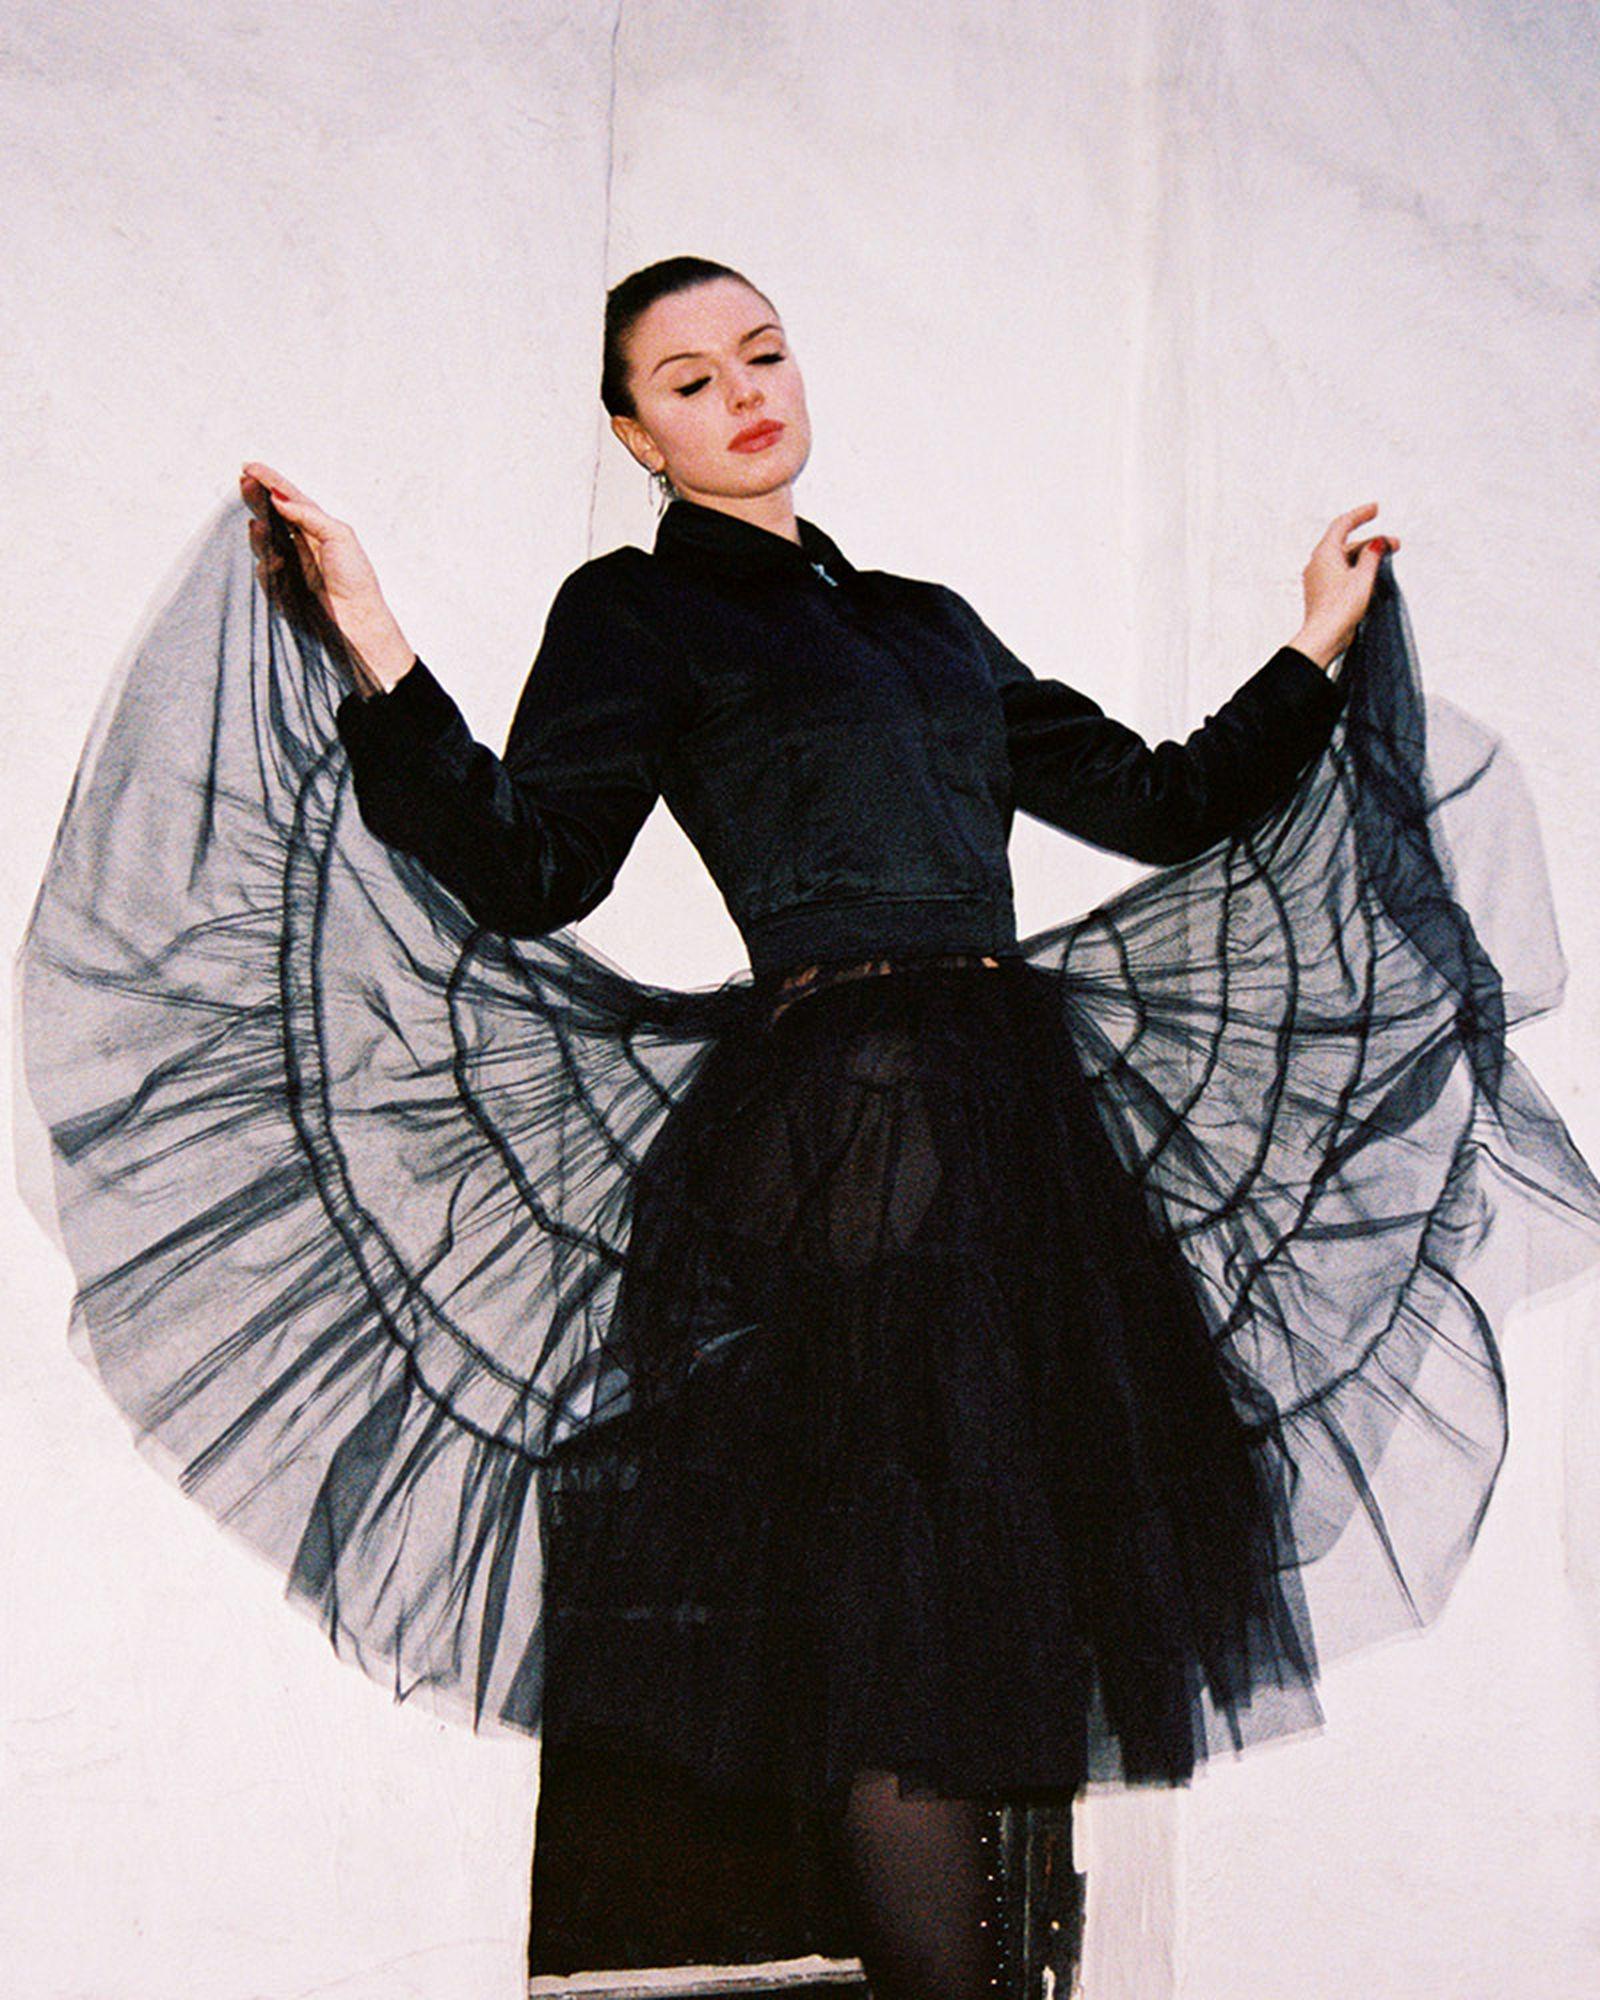 julia-fox-richie-shazam-interview-honors-week-04